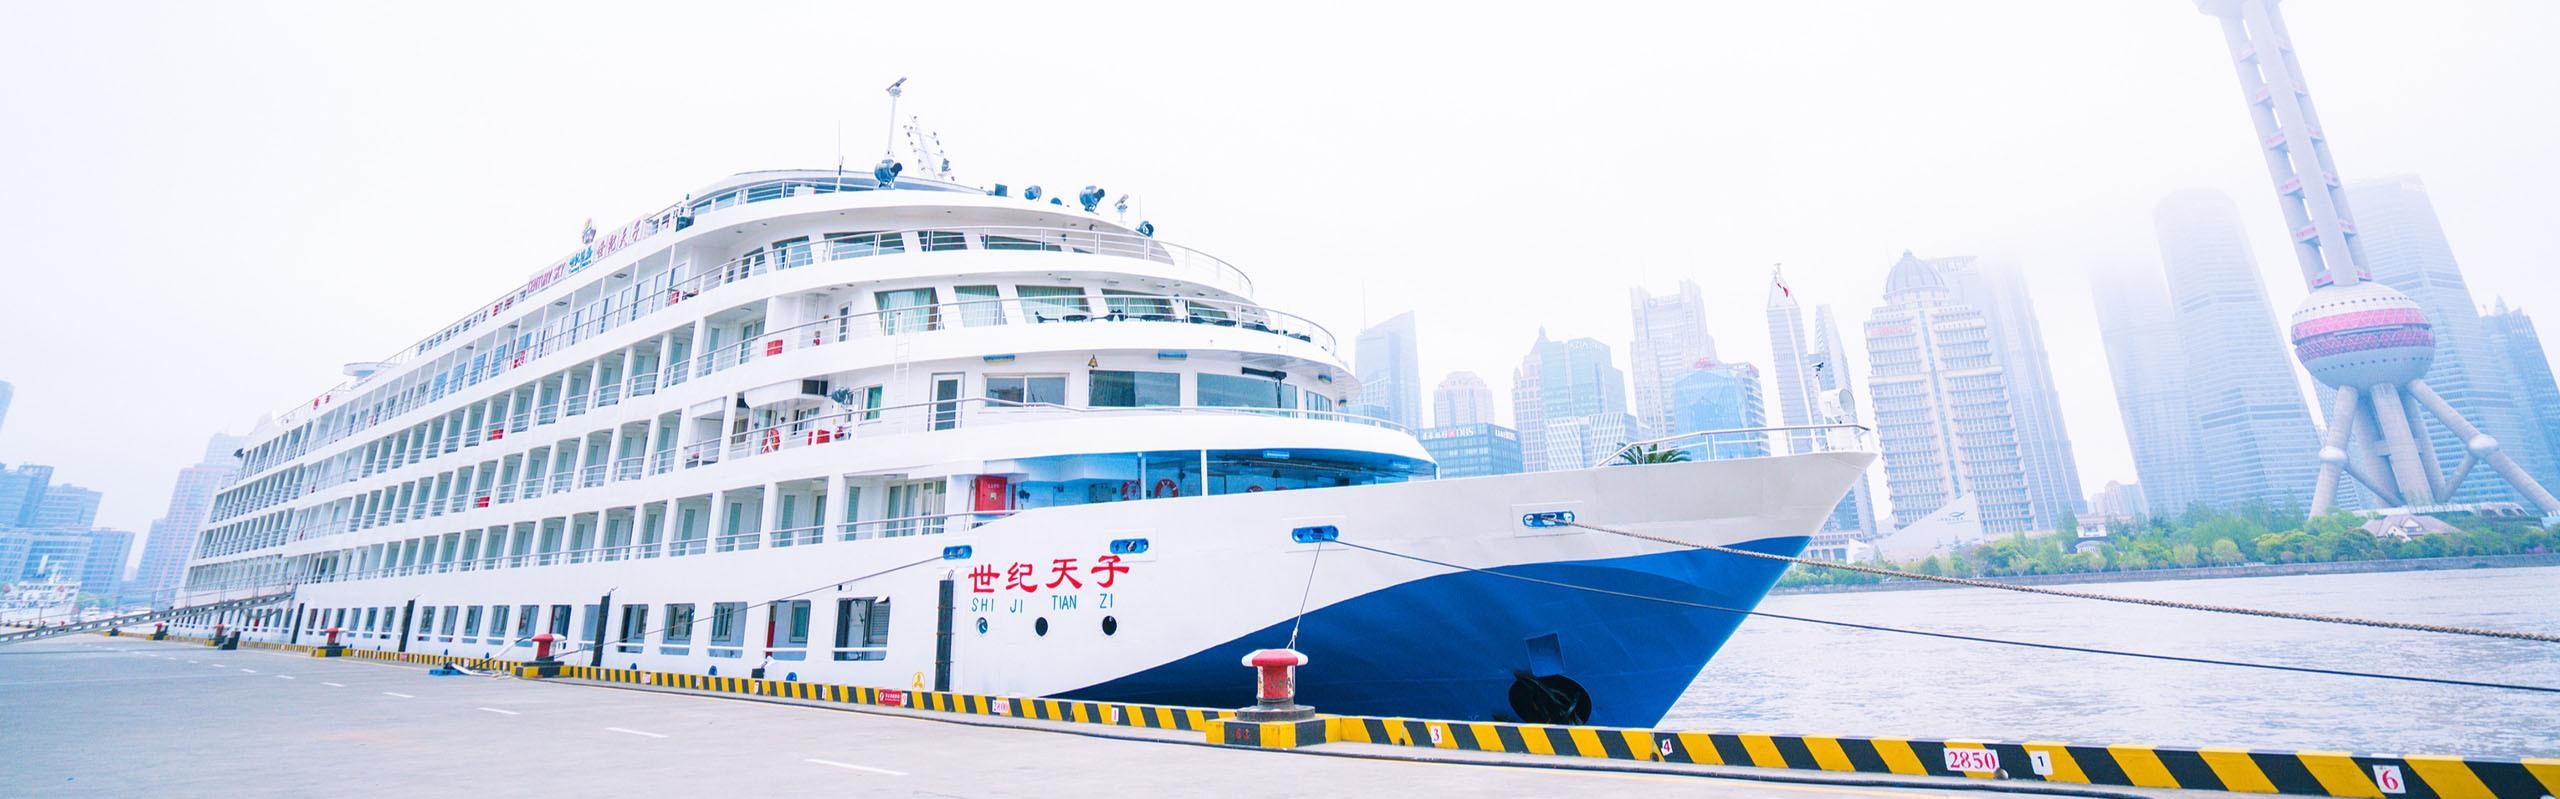 Century Sky Cruise